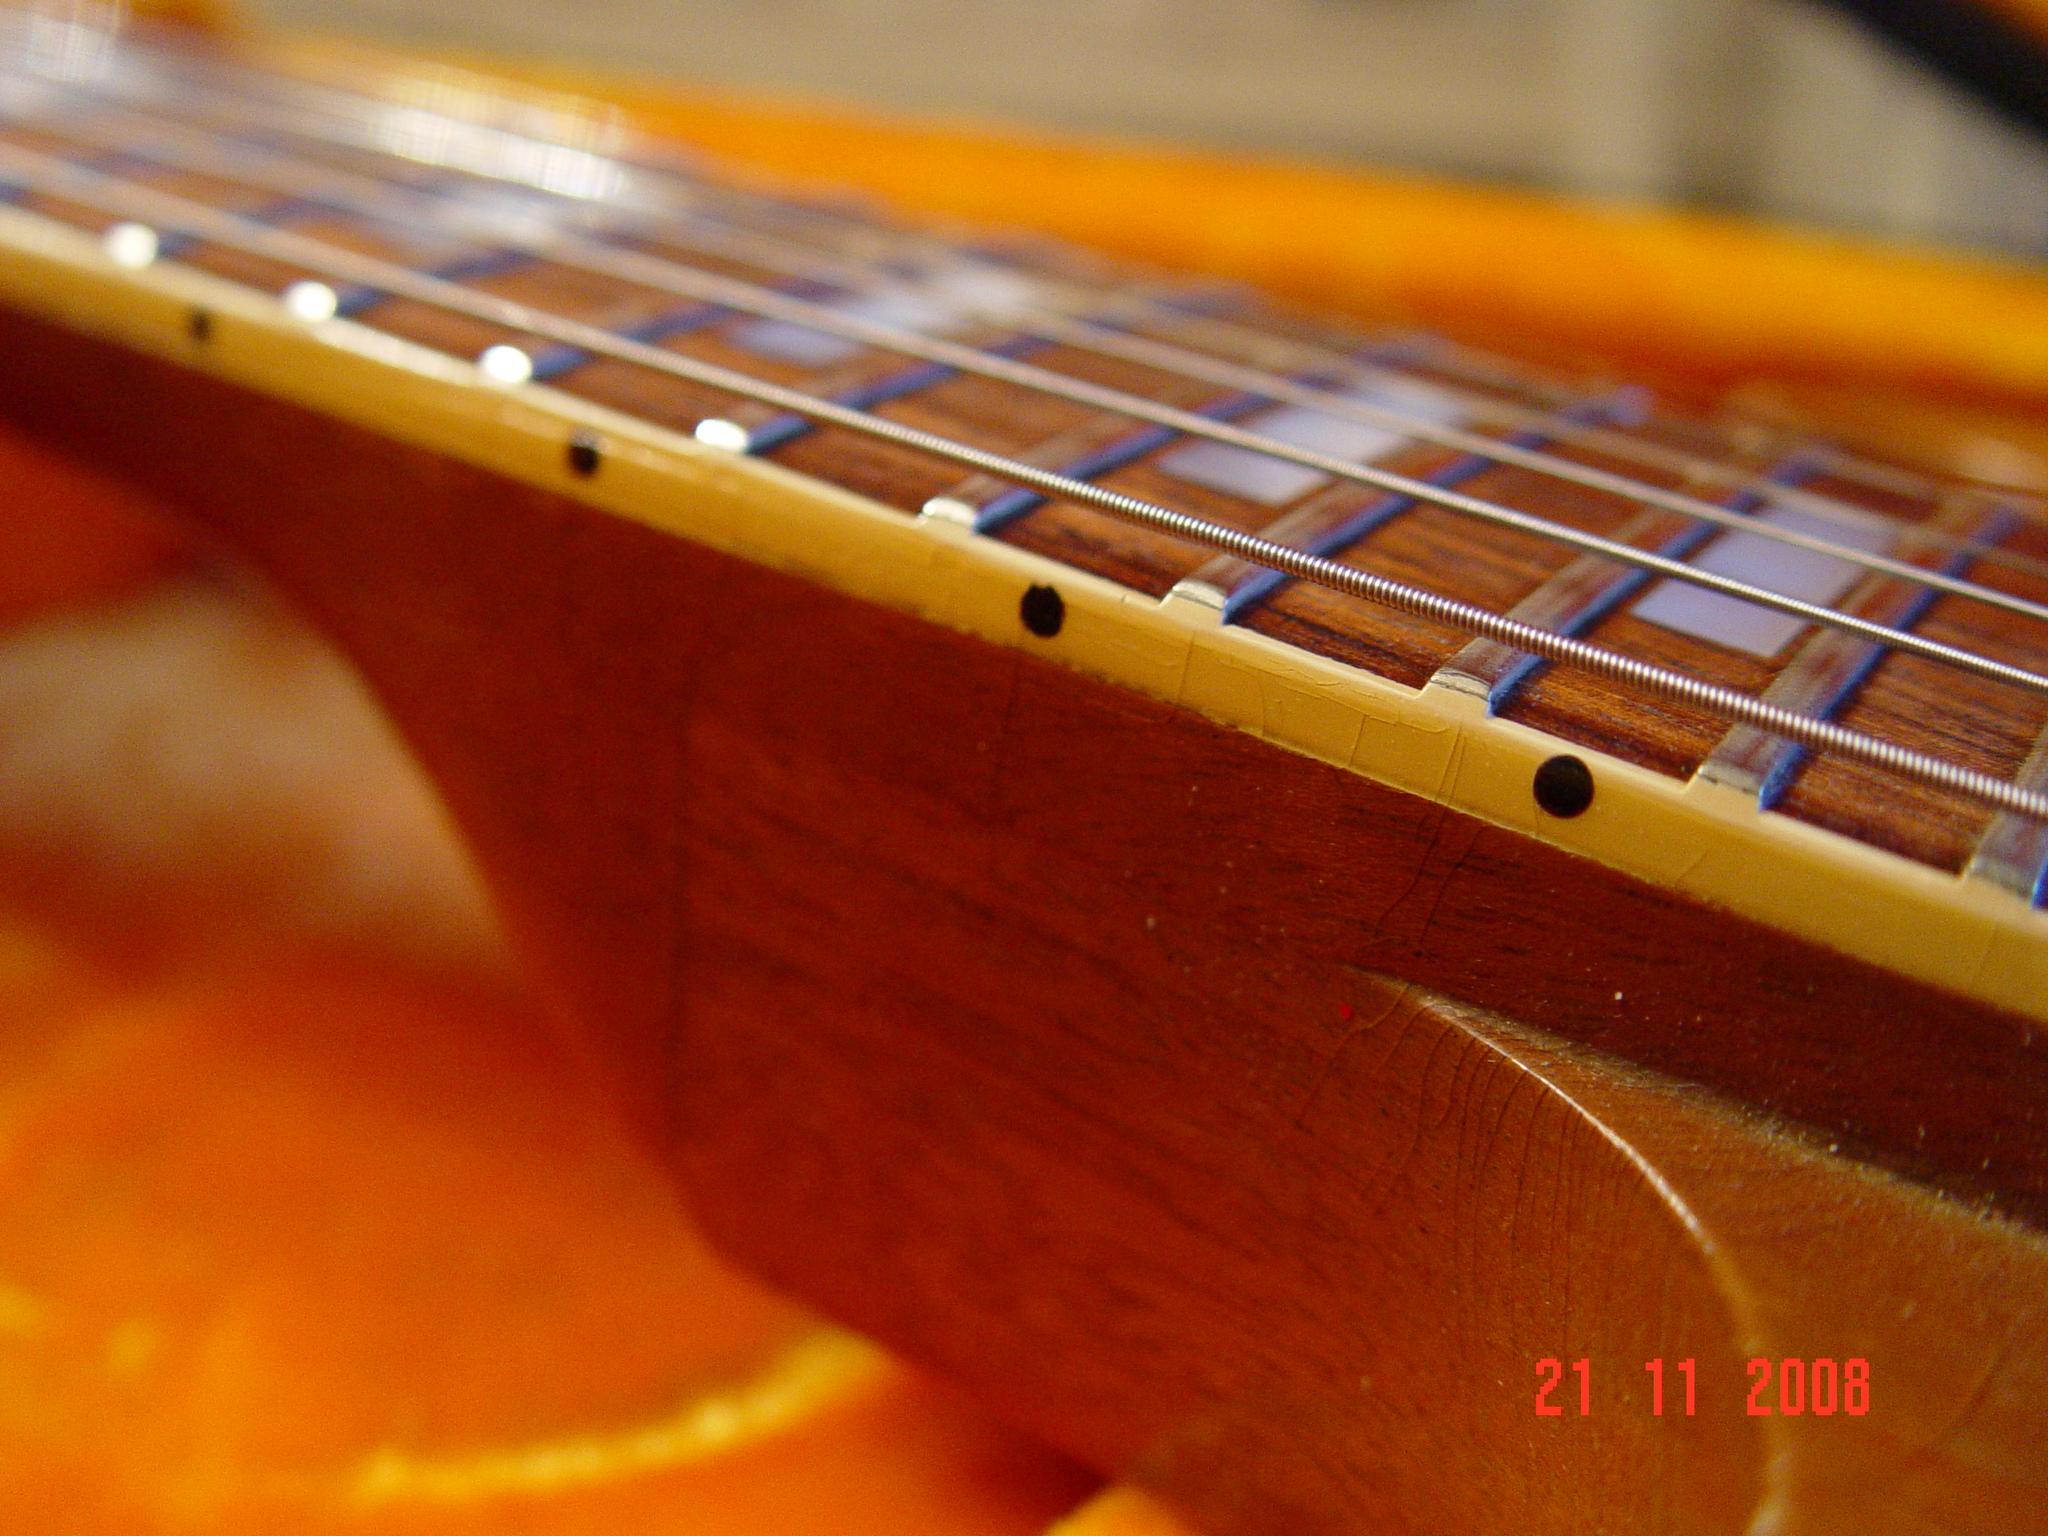 Fretless Wonder Fretboard Vintage Gibson SG Deluxe